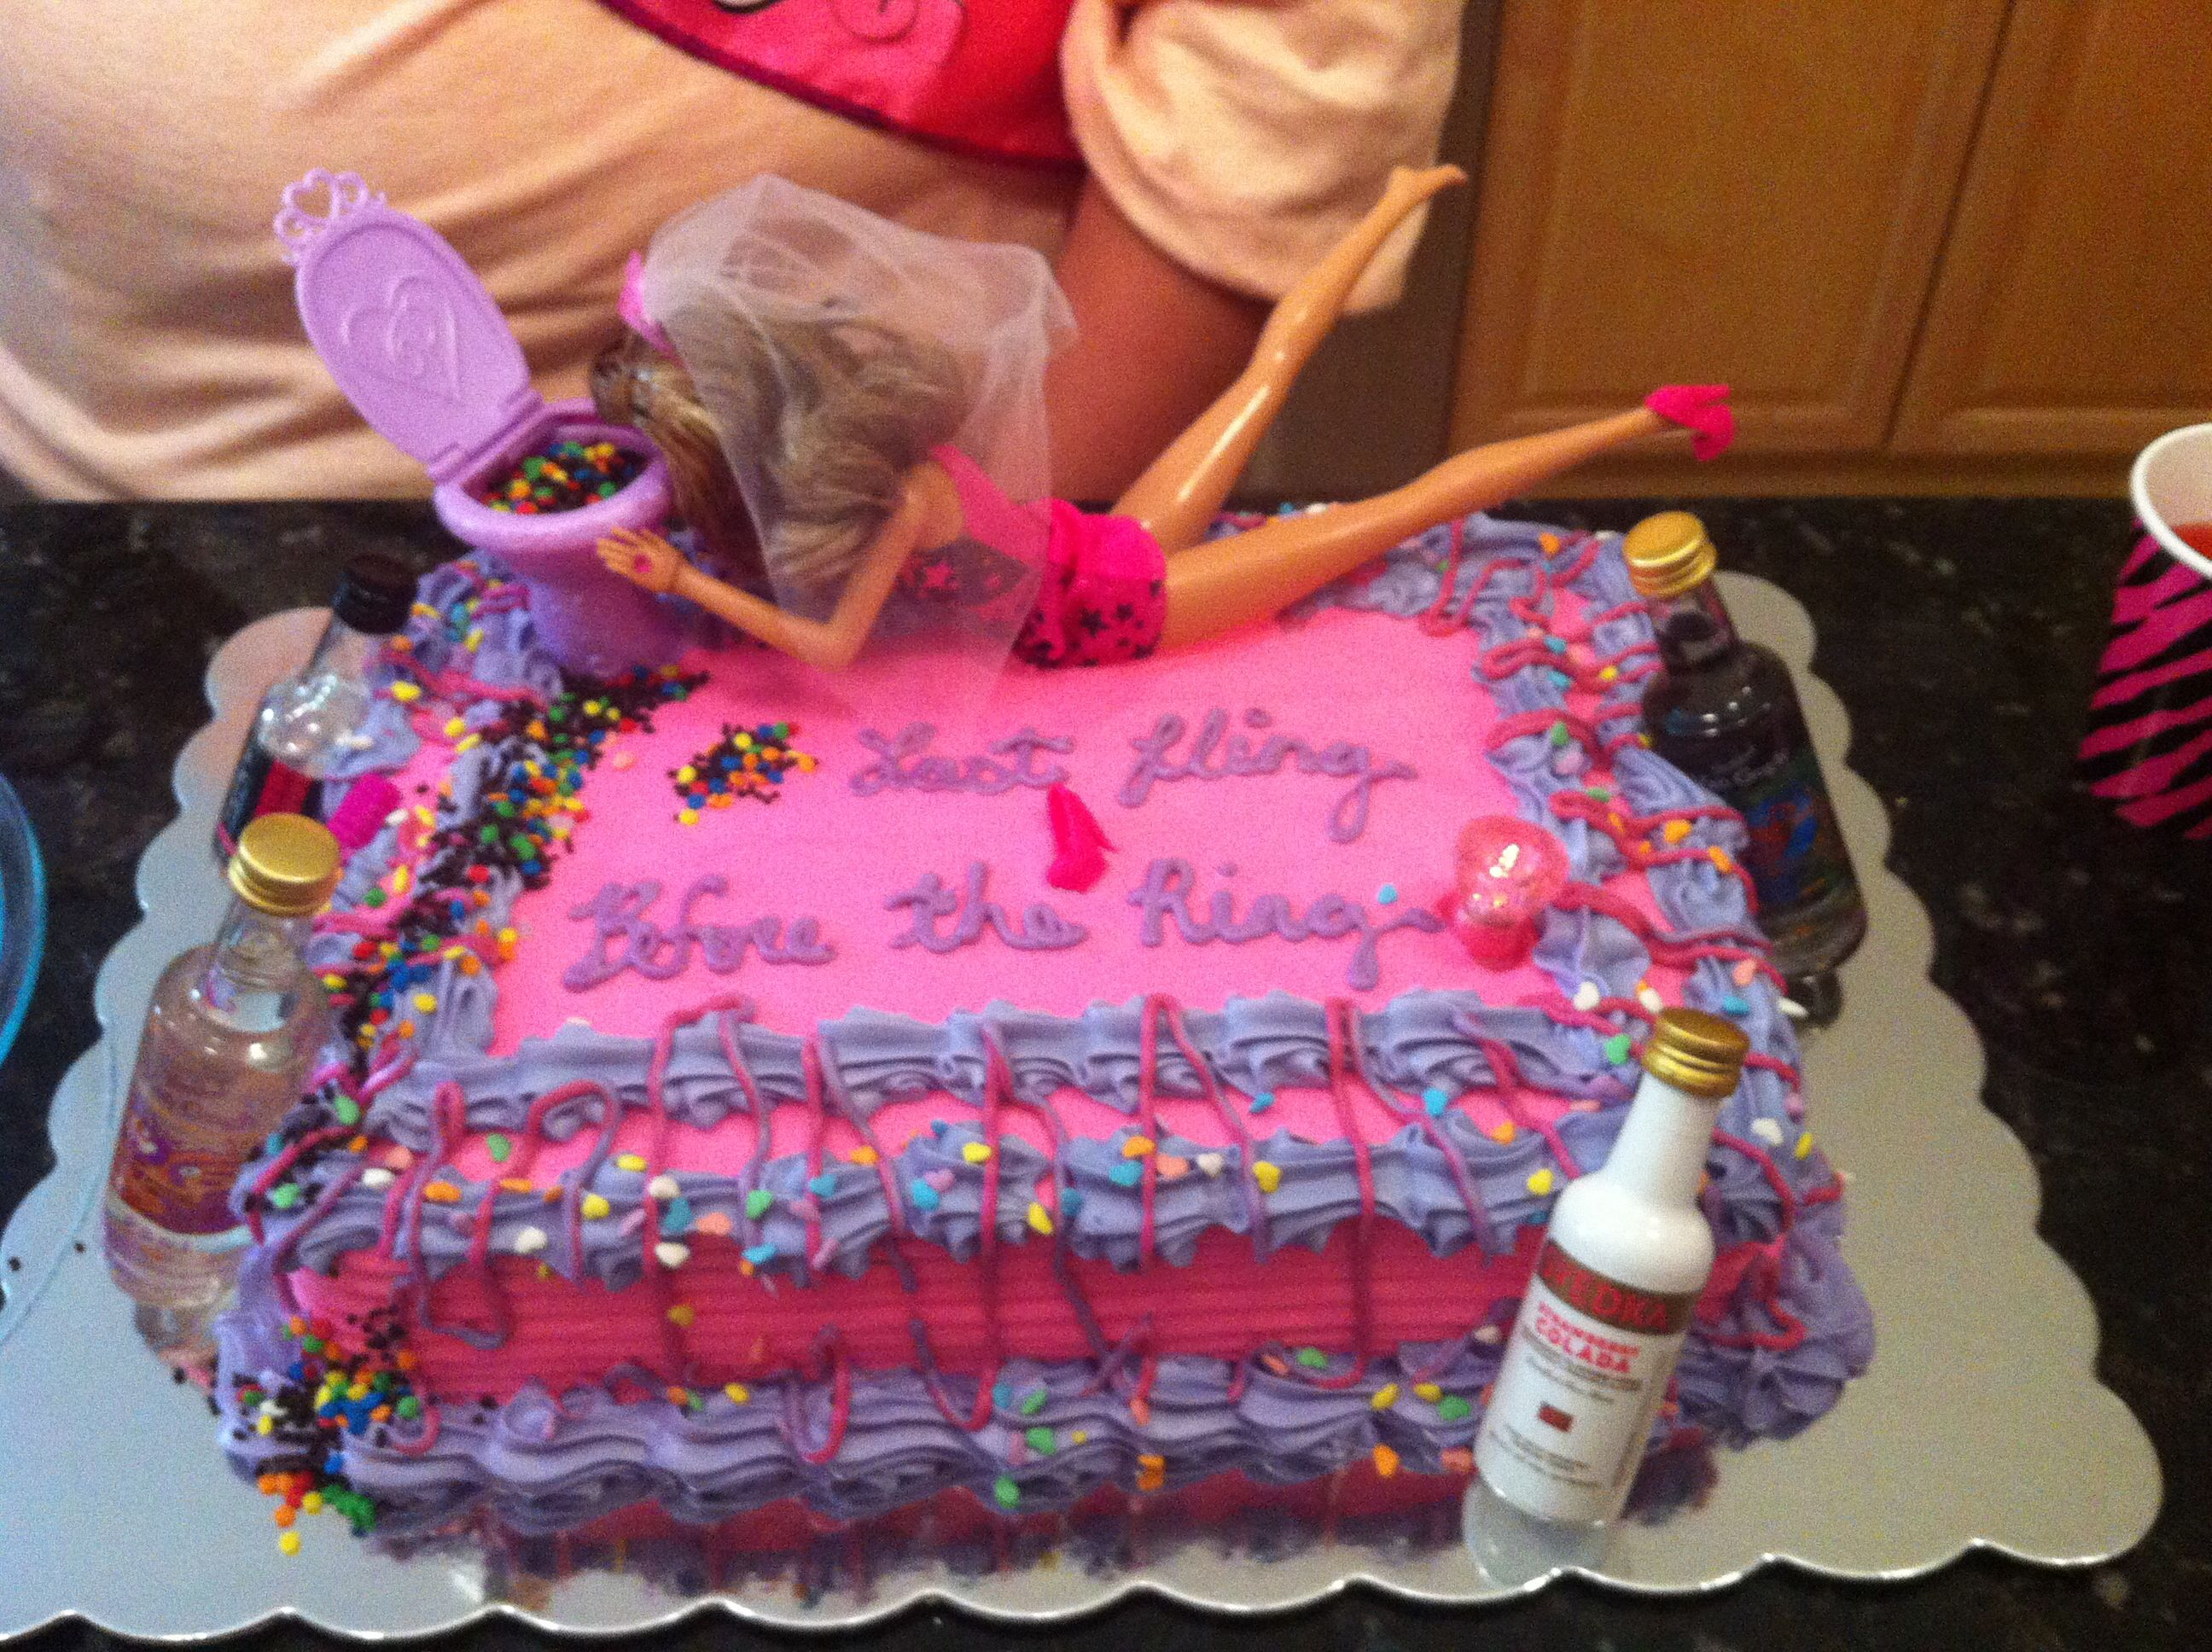 Drunk Barbie Cake Images : Drunk Barbie Cake Drunk Barbie Cakes ! Pinterest